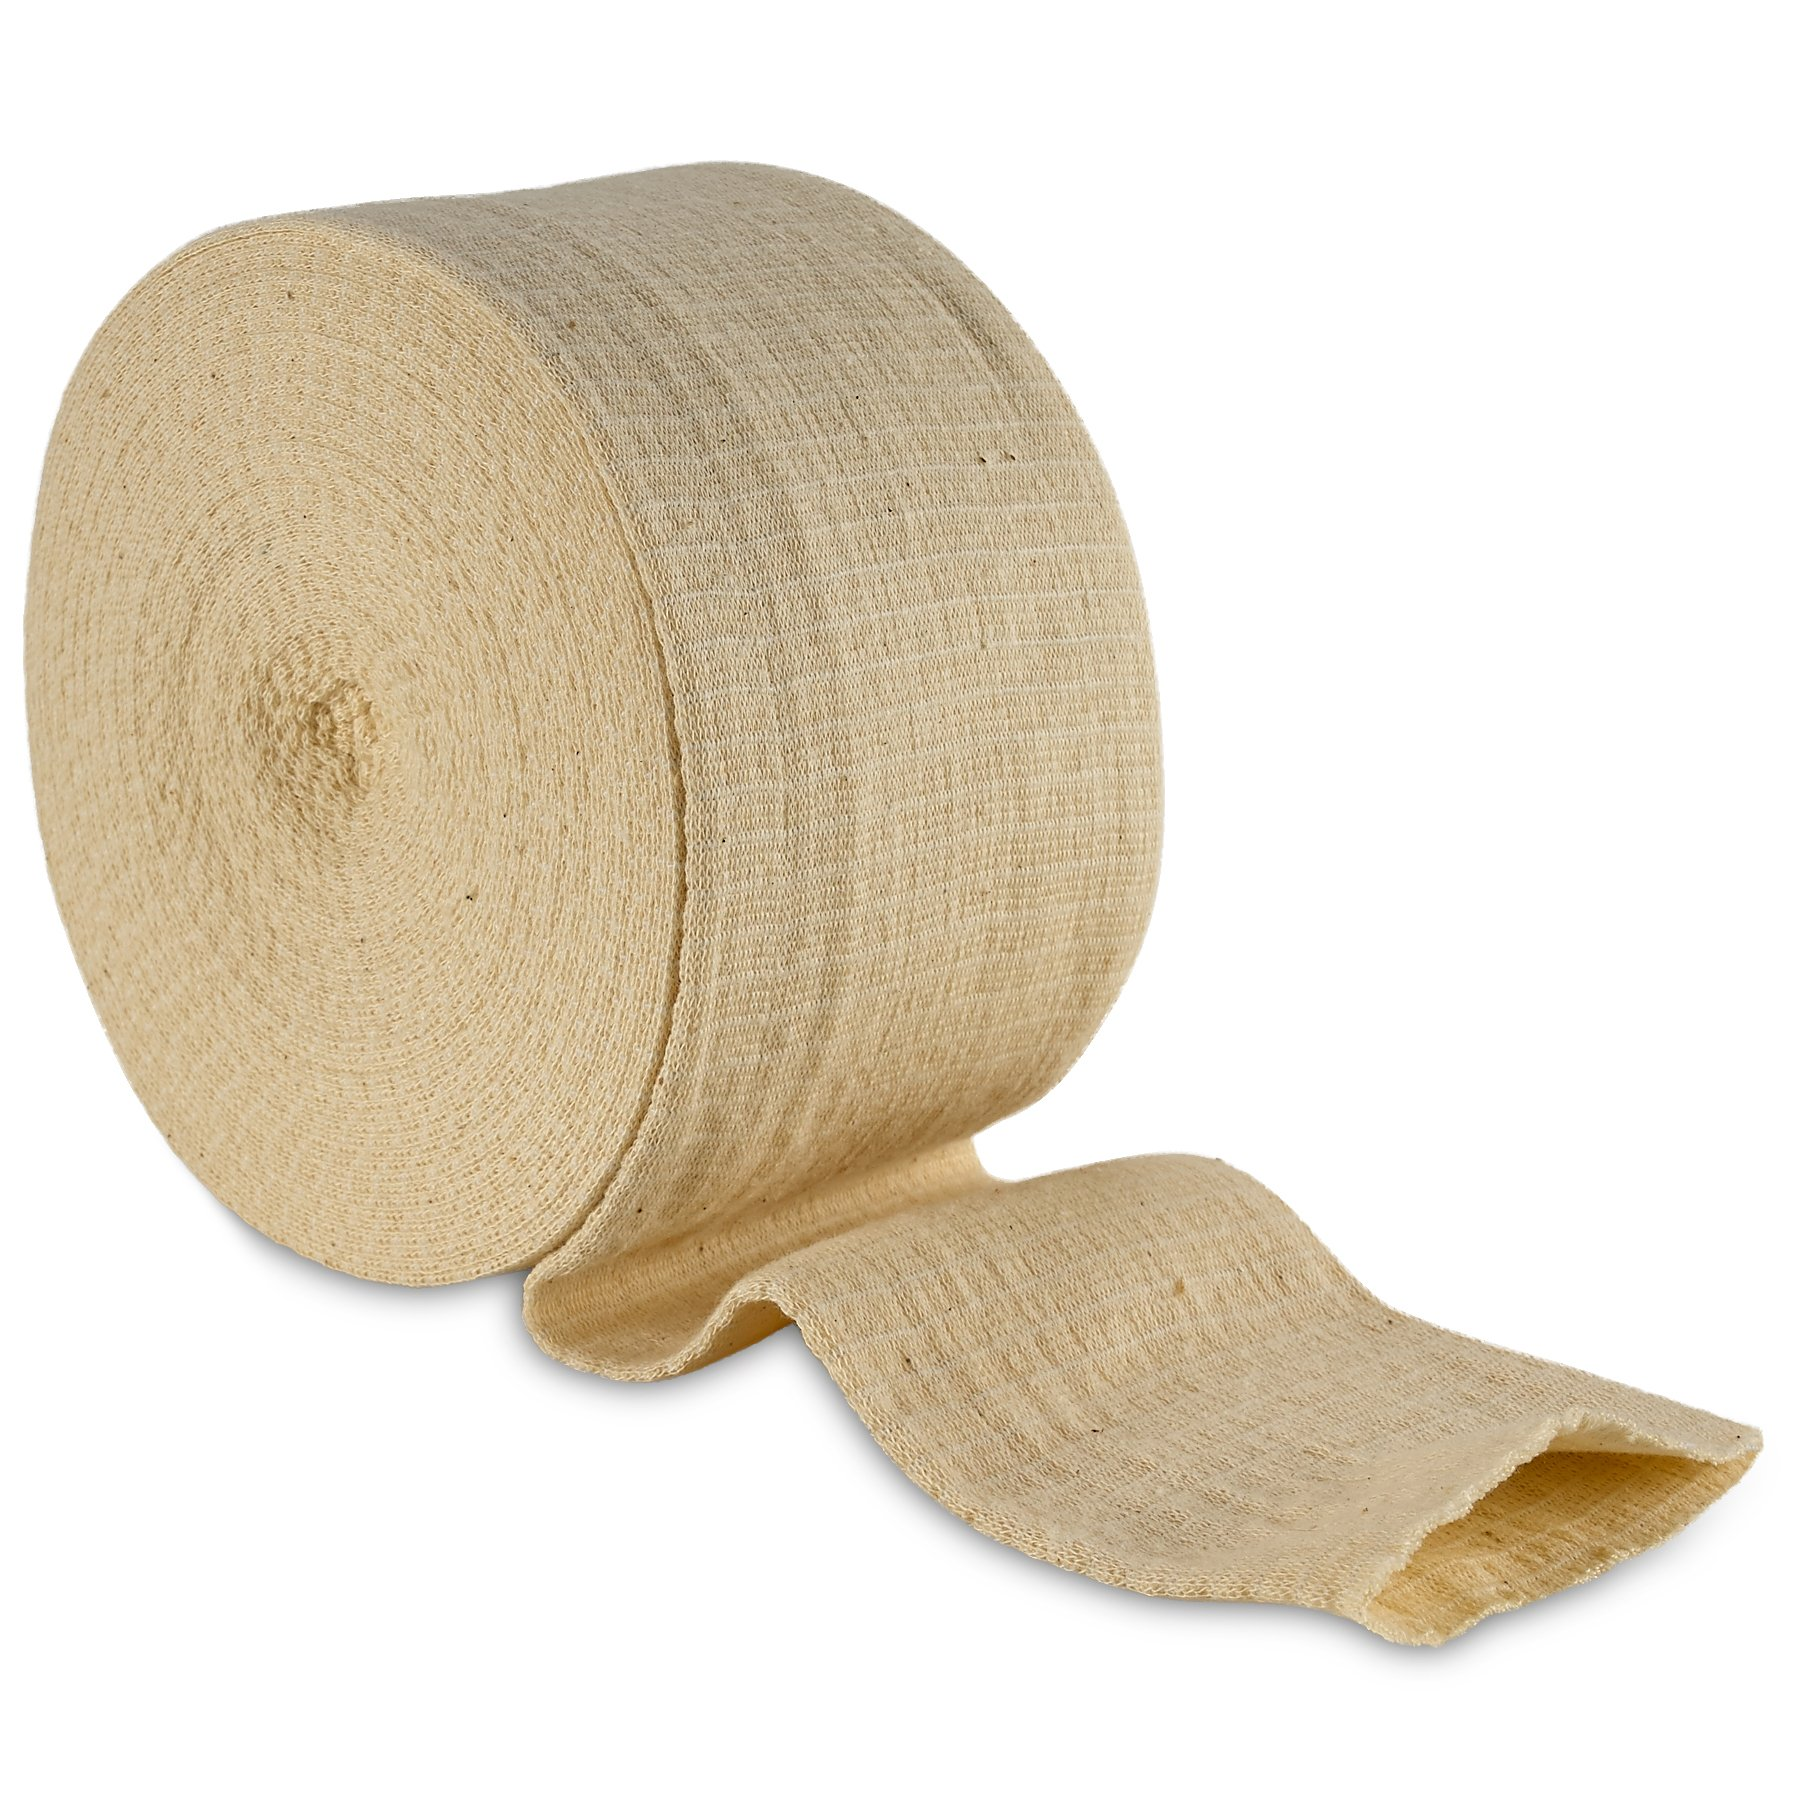 Elastic Tubular Support Bandage Size E, 10M Box - Natural Color (3.5'' X 33 feet) for Large Knee Support Bandage -Medium Thigh, Cotton Spandex